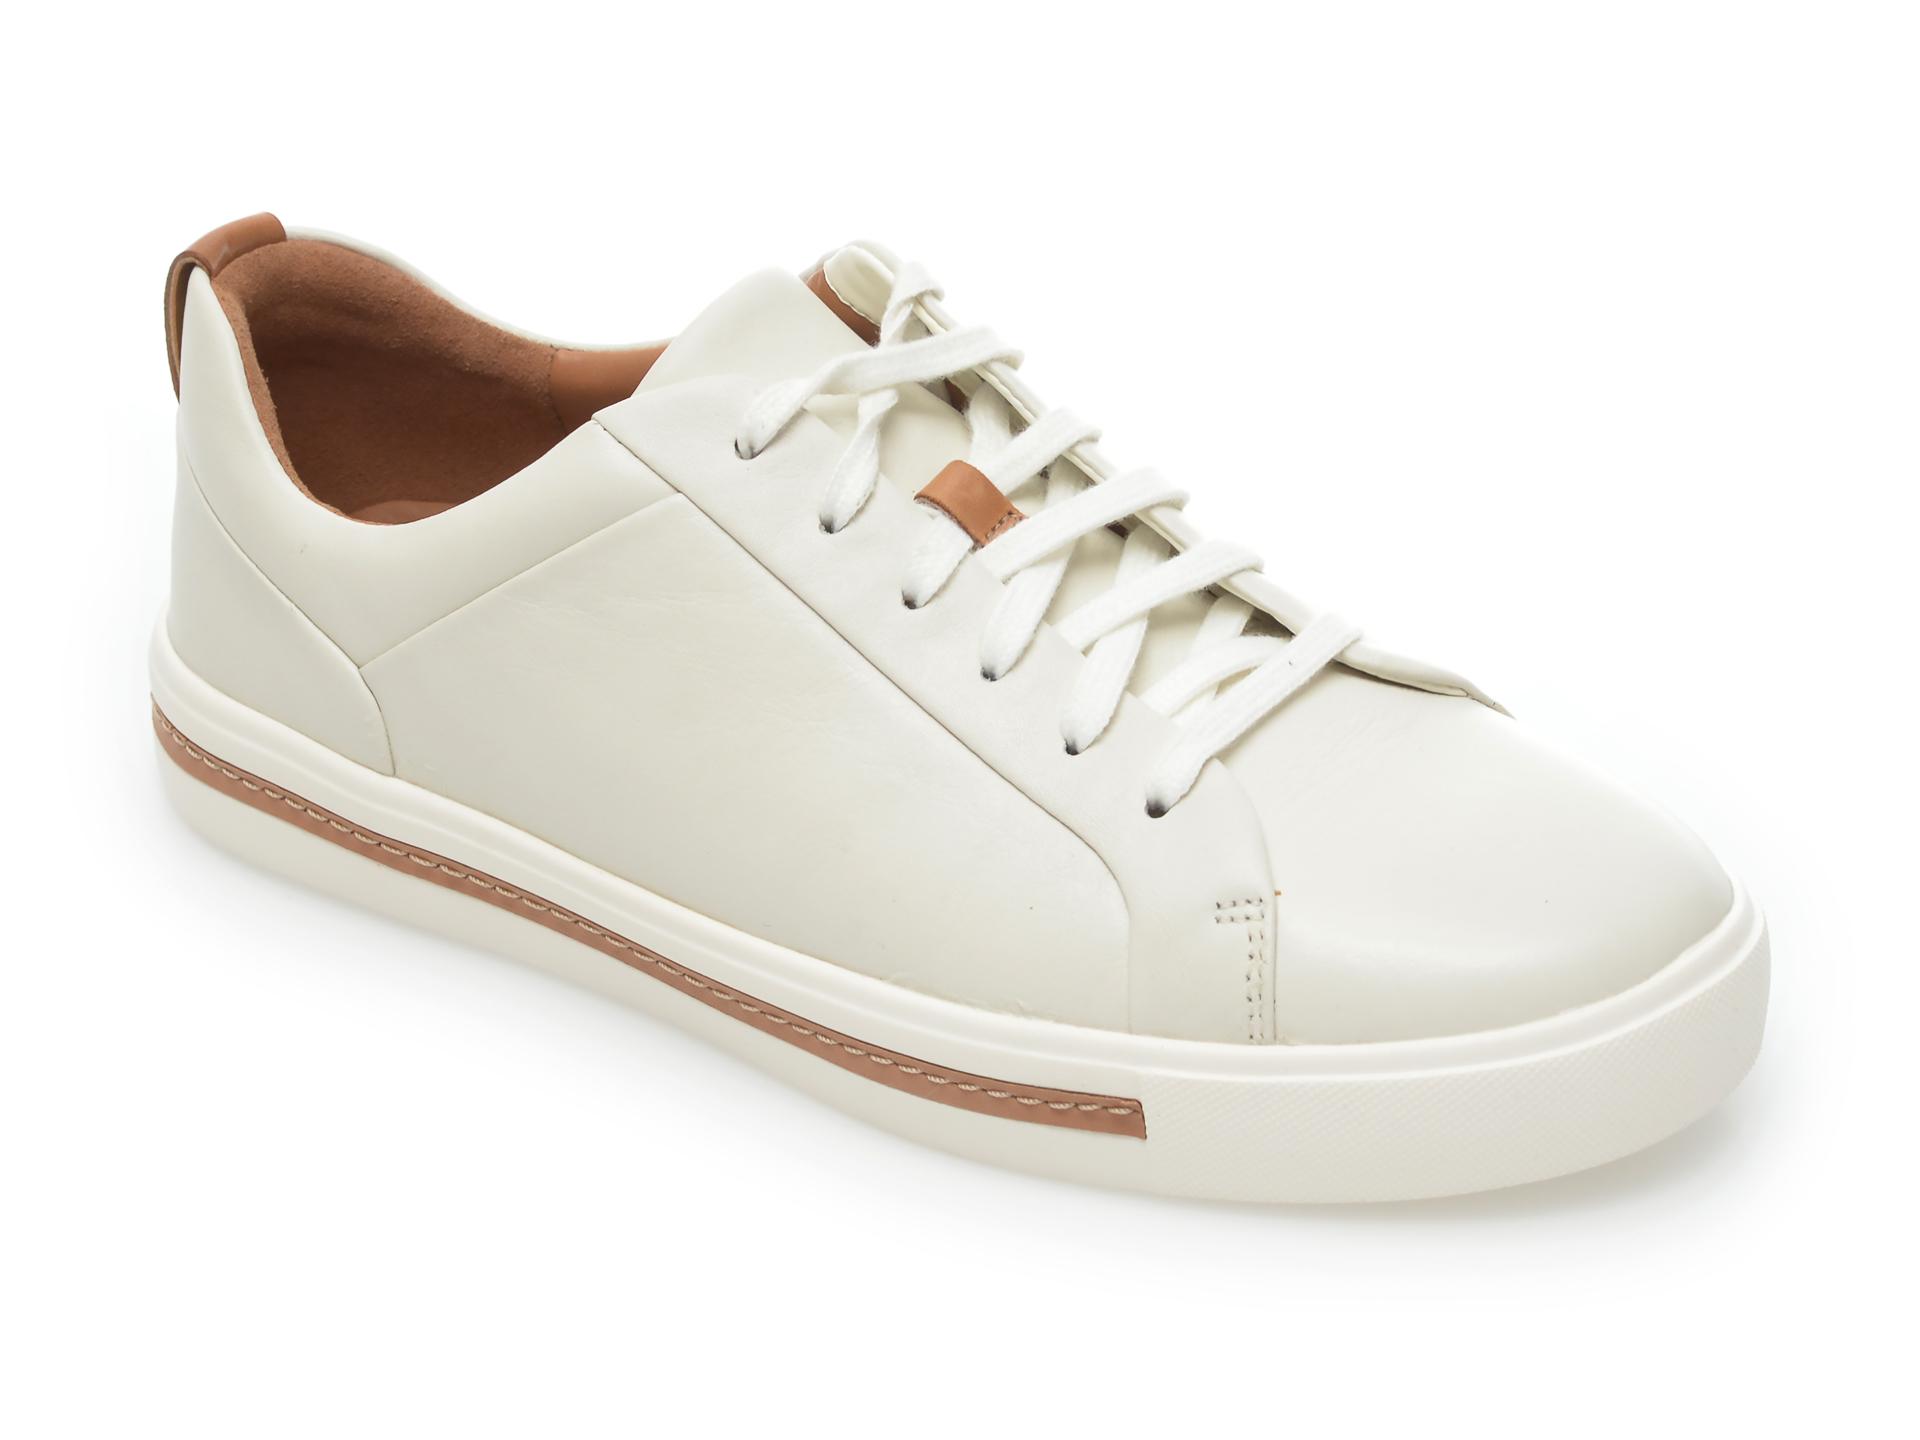 Pantofi CLARKS albi, Un Maui Lace, din piele naturala imagine otter.ro